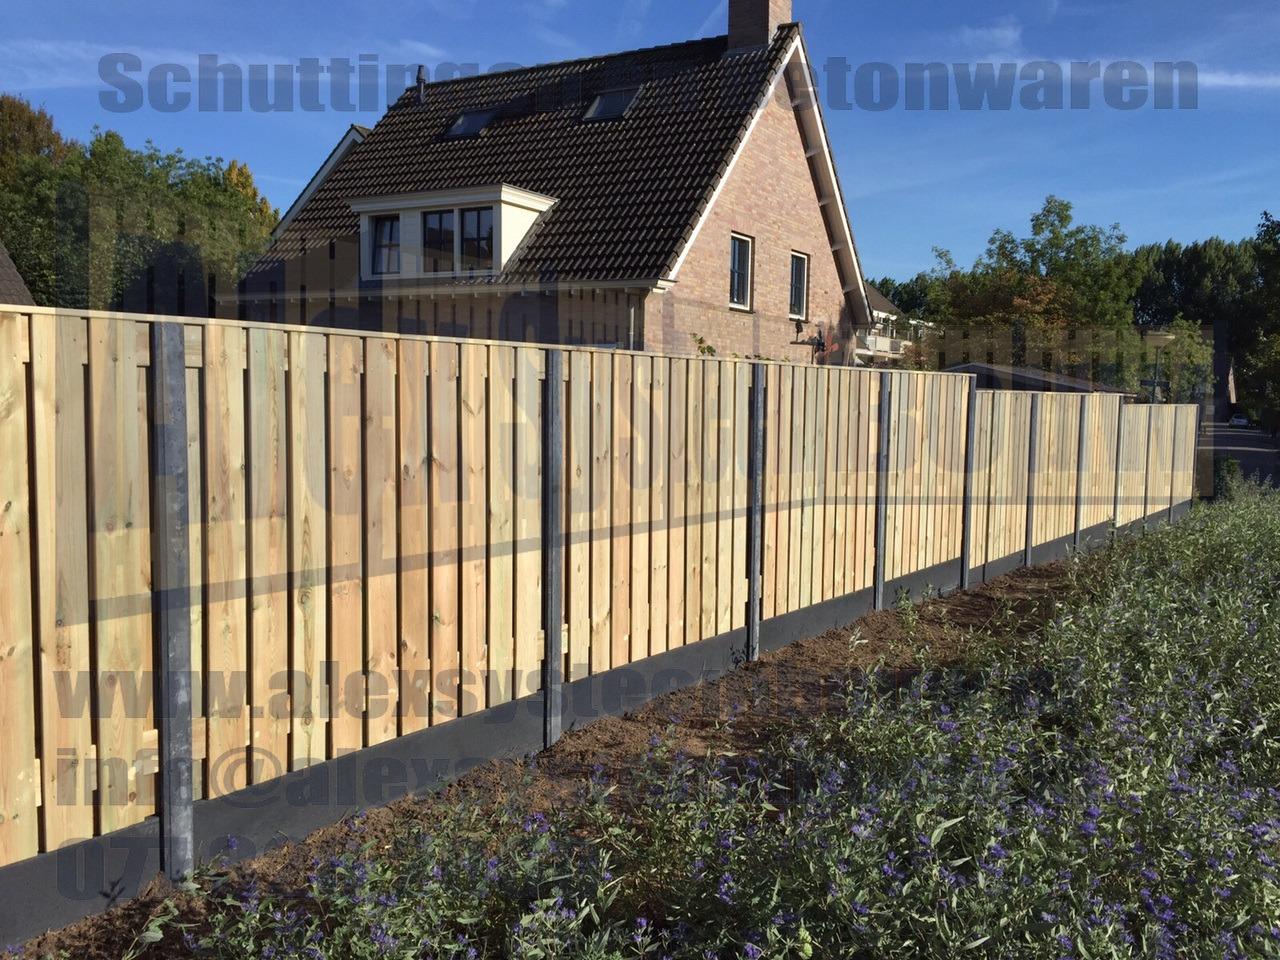 privacy-schutting-hout-beton-23-planks-tuinschermen